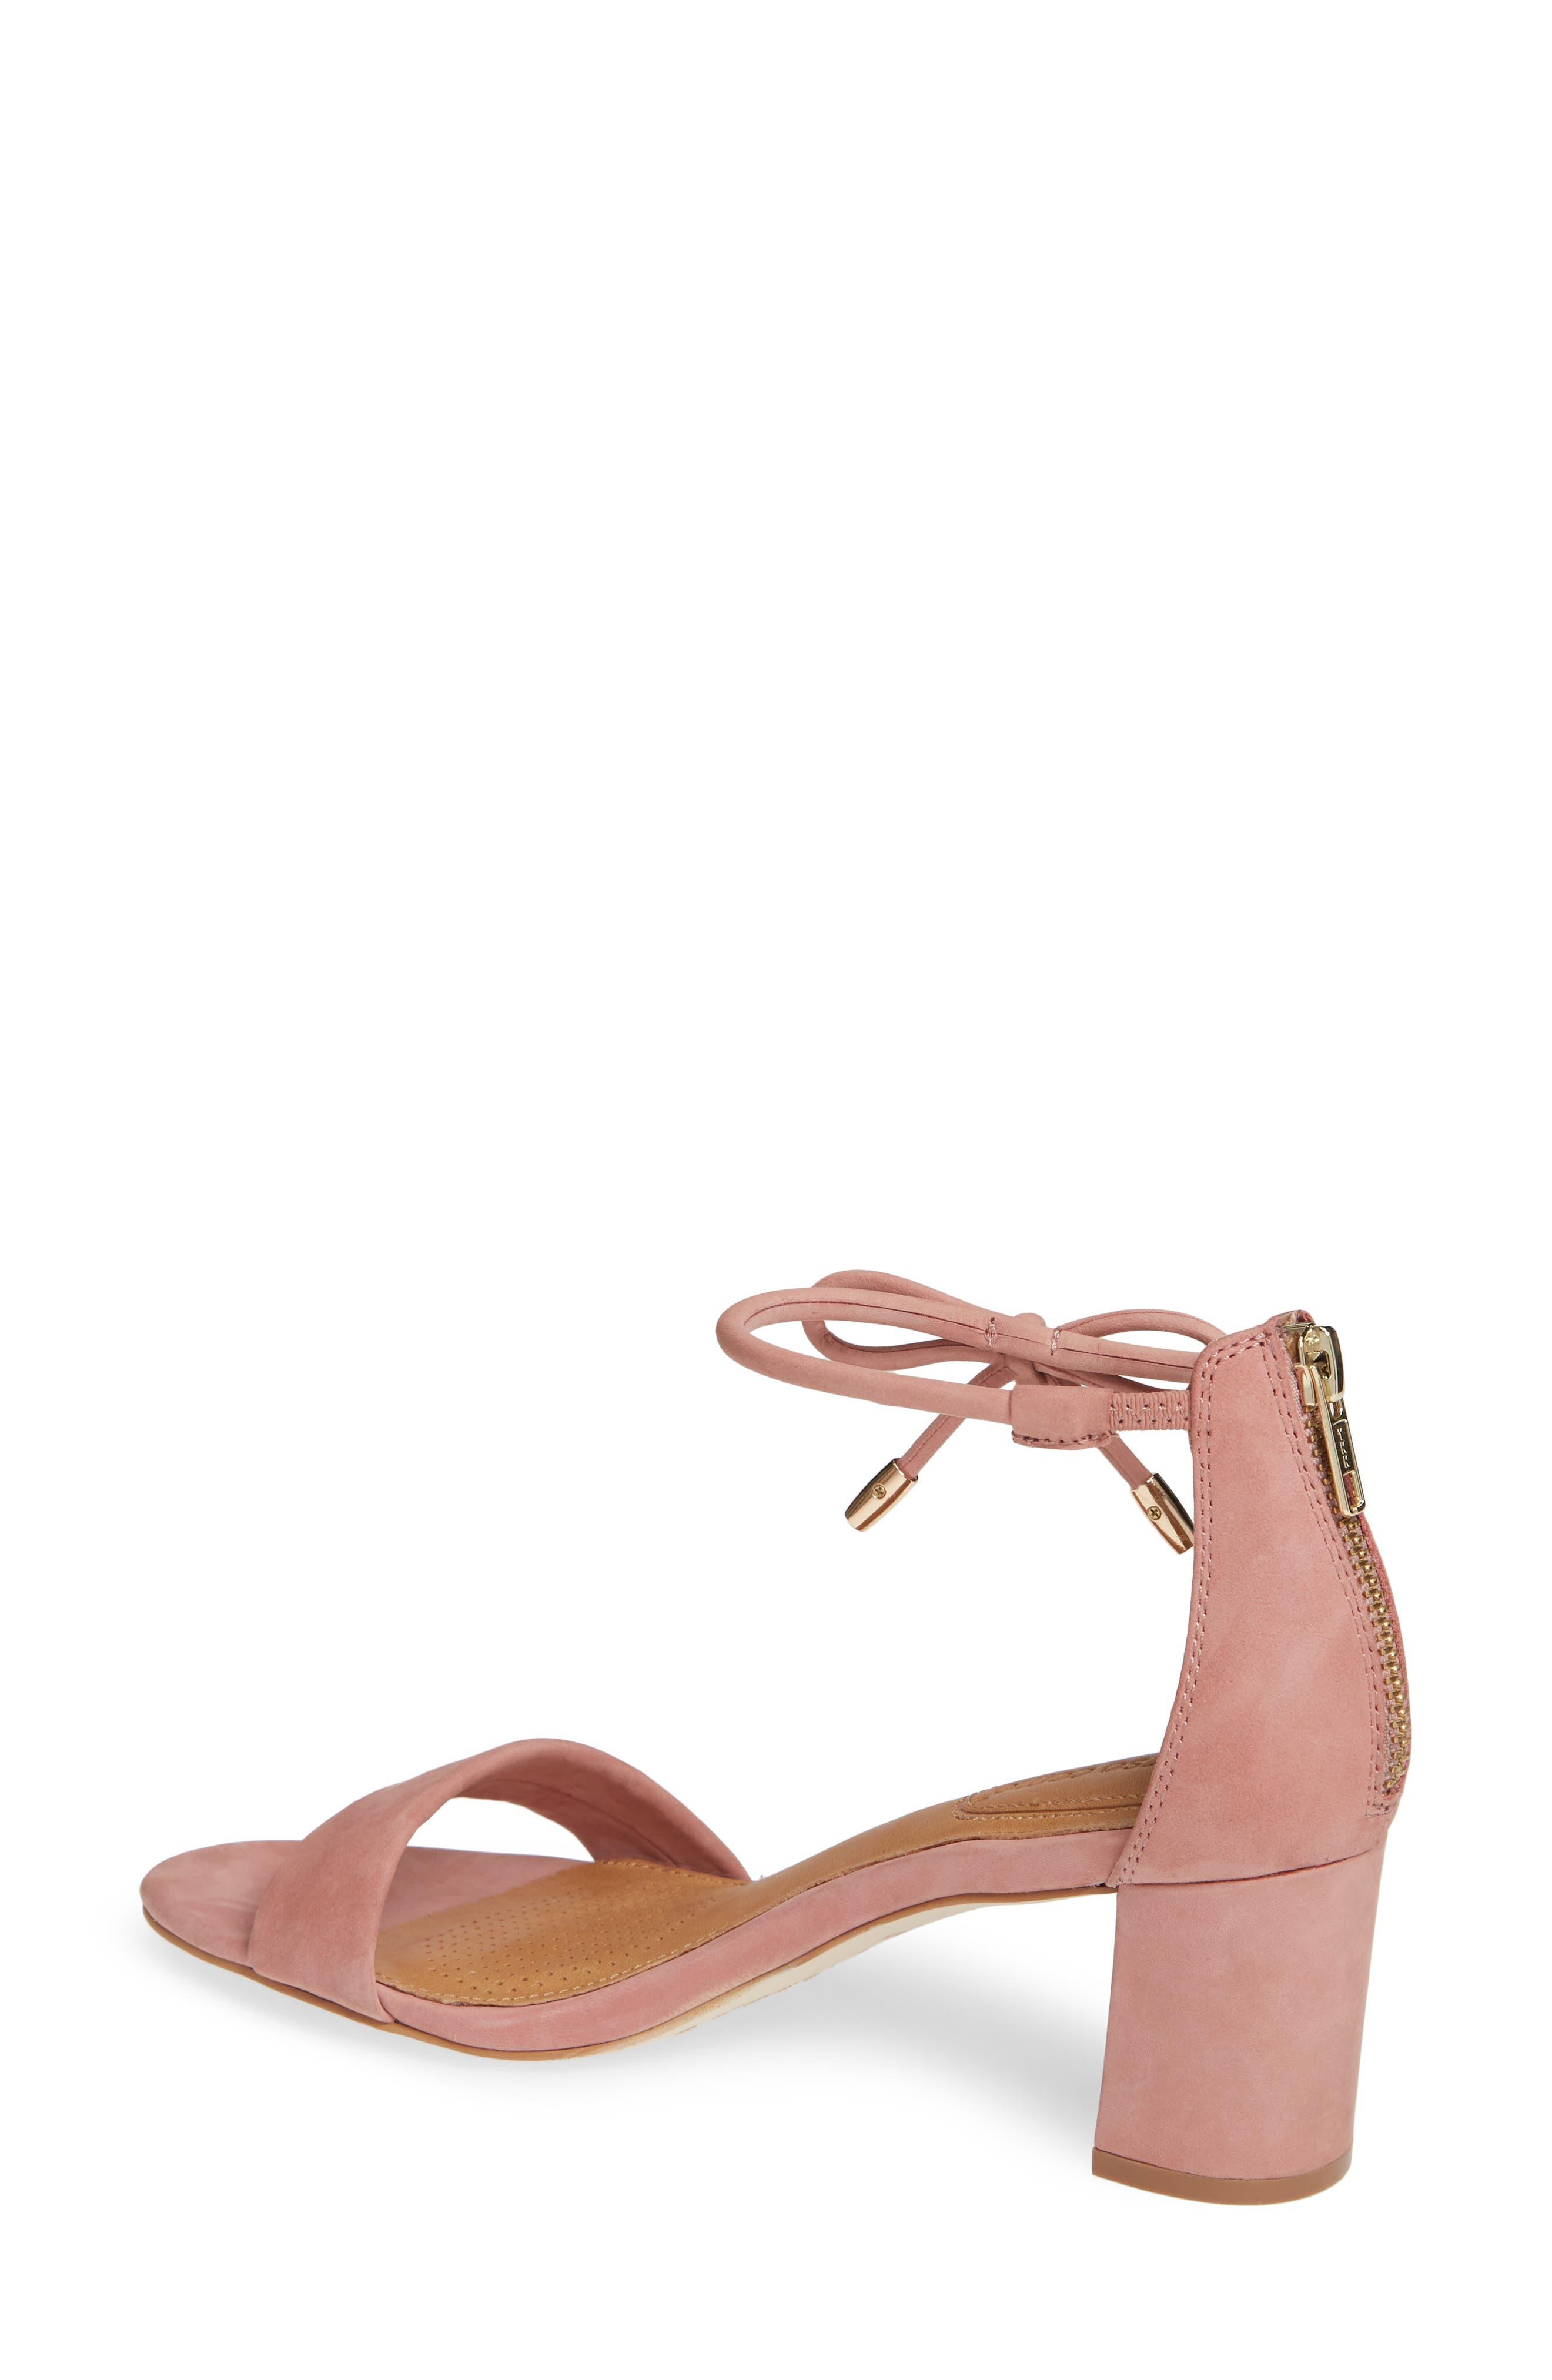 Celebratt Ankle Strap Sandal,                             Alternate thumbnail 2, color,                             OLD ROSE NUBUCK LEATHER